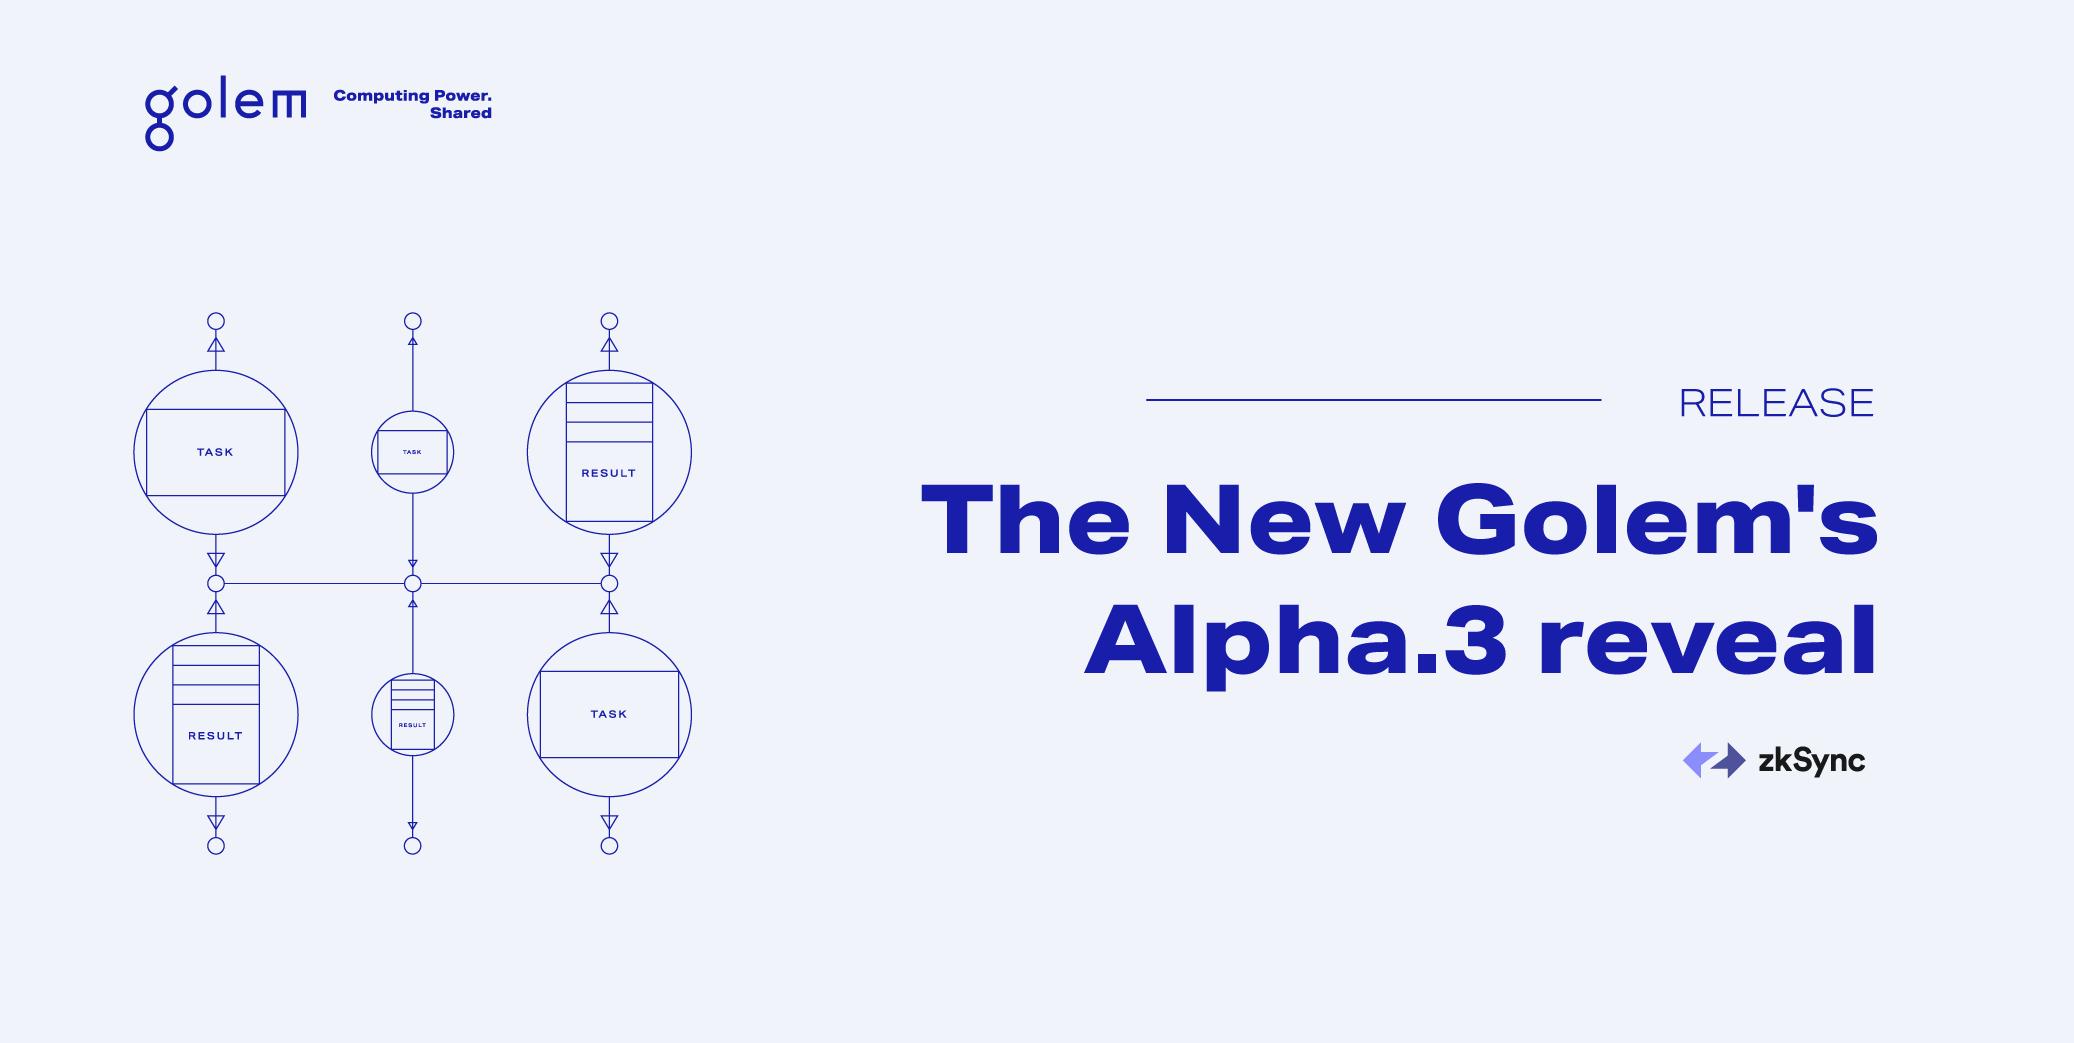 New Golem's Alpha.3 reveal - zkSync integration + more!